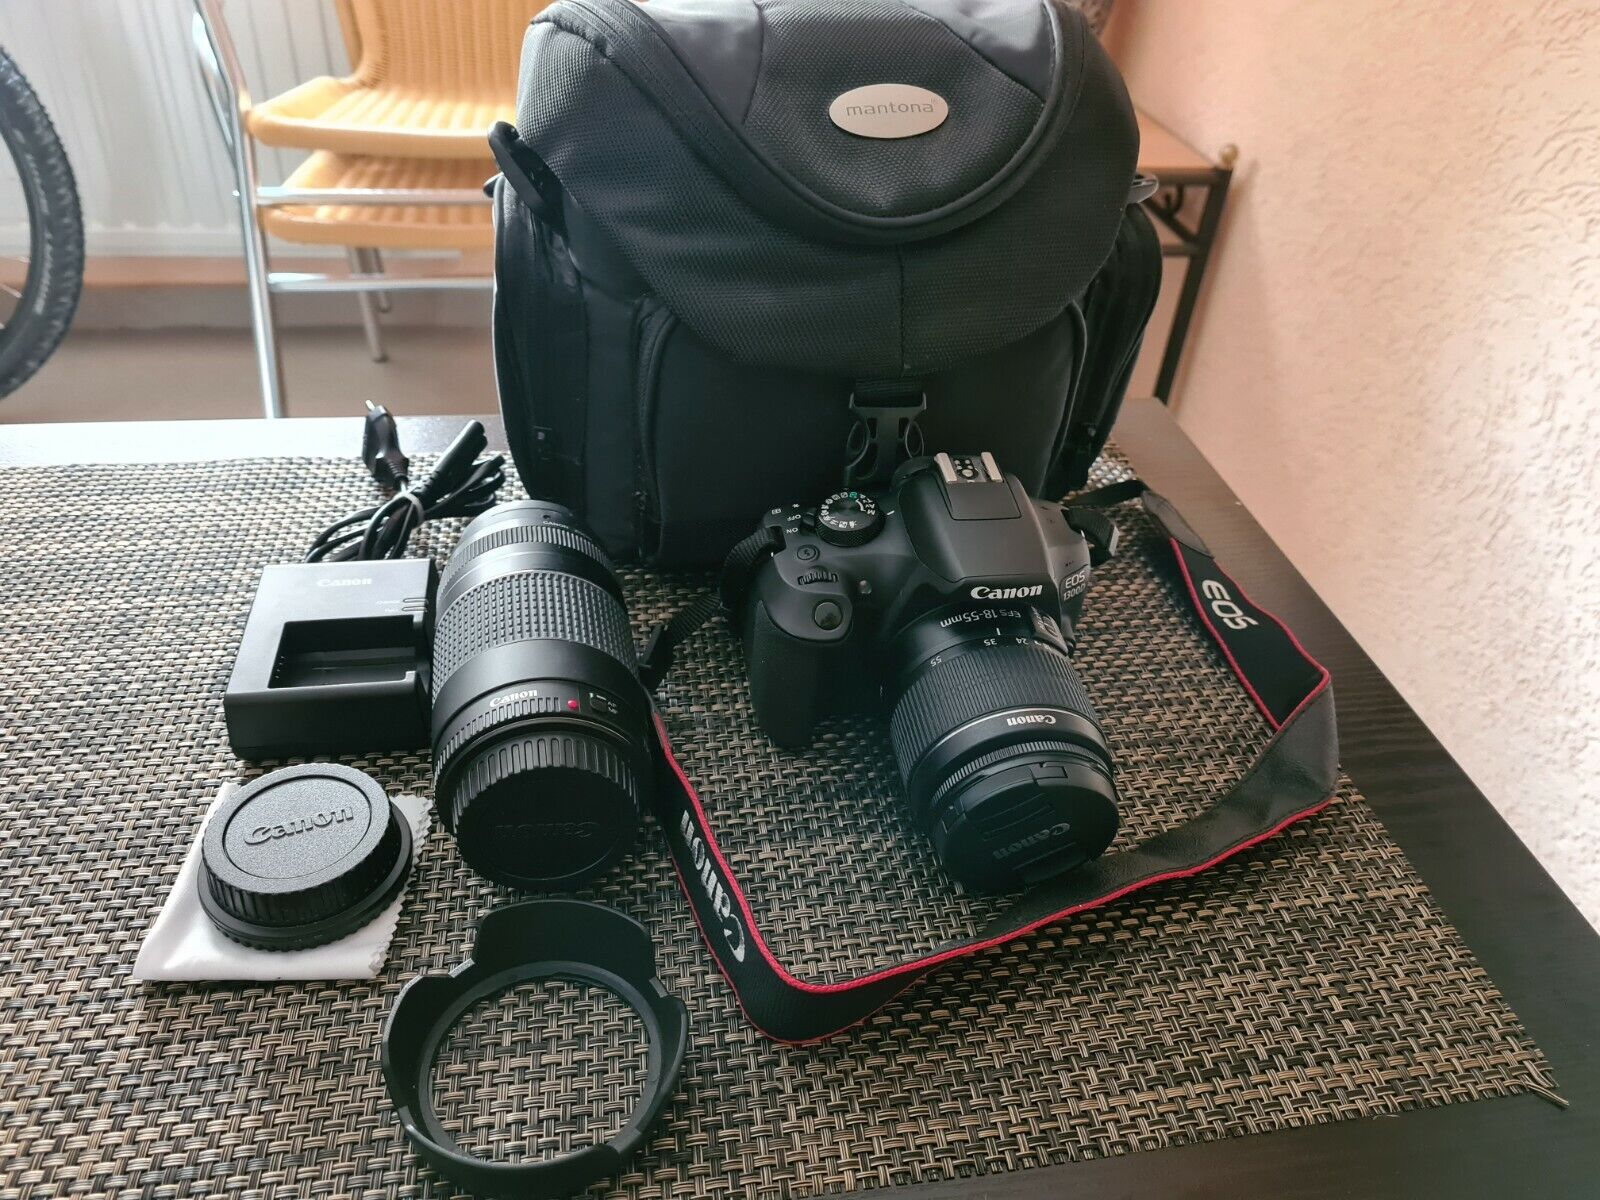 CANON EOS 1300D Kit Spiegelreflexkamera, Full HD, 18-55 mm, 75-300 mm Objektiv